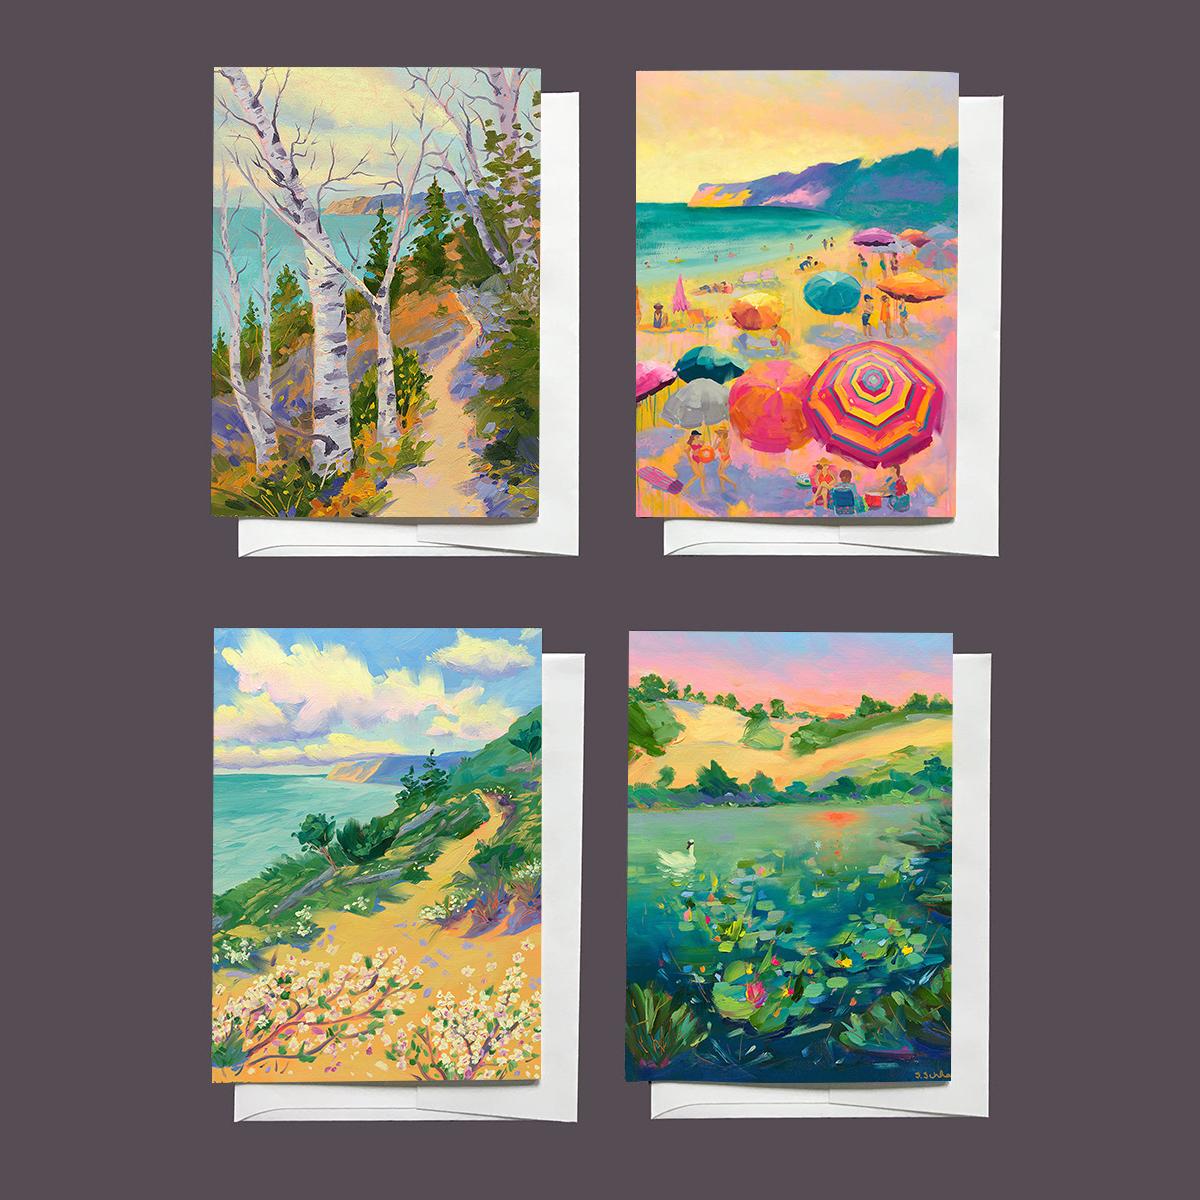 Sleeping Bear Dunes Notecards Series 3 by Stephanie Schlatter